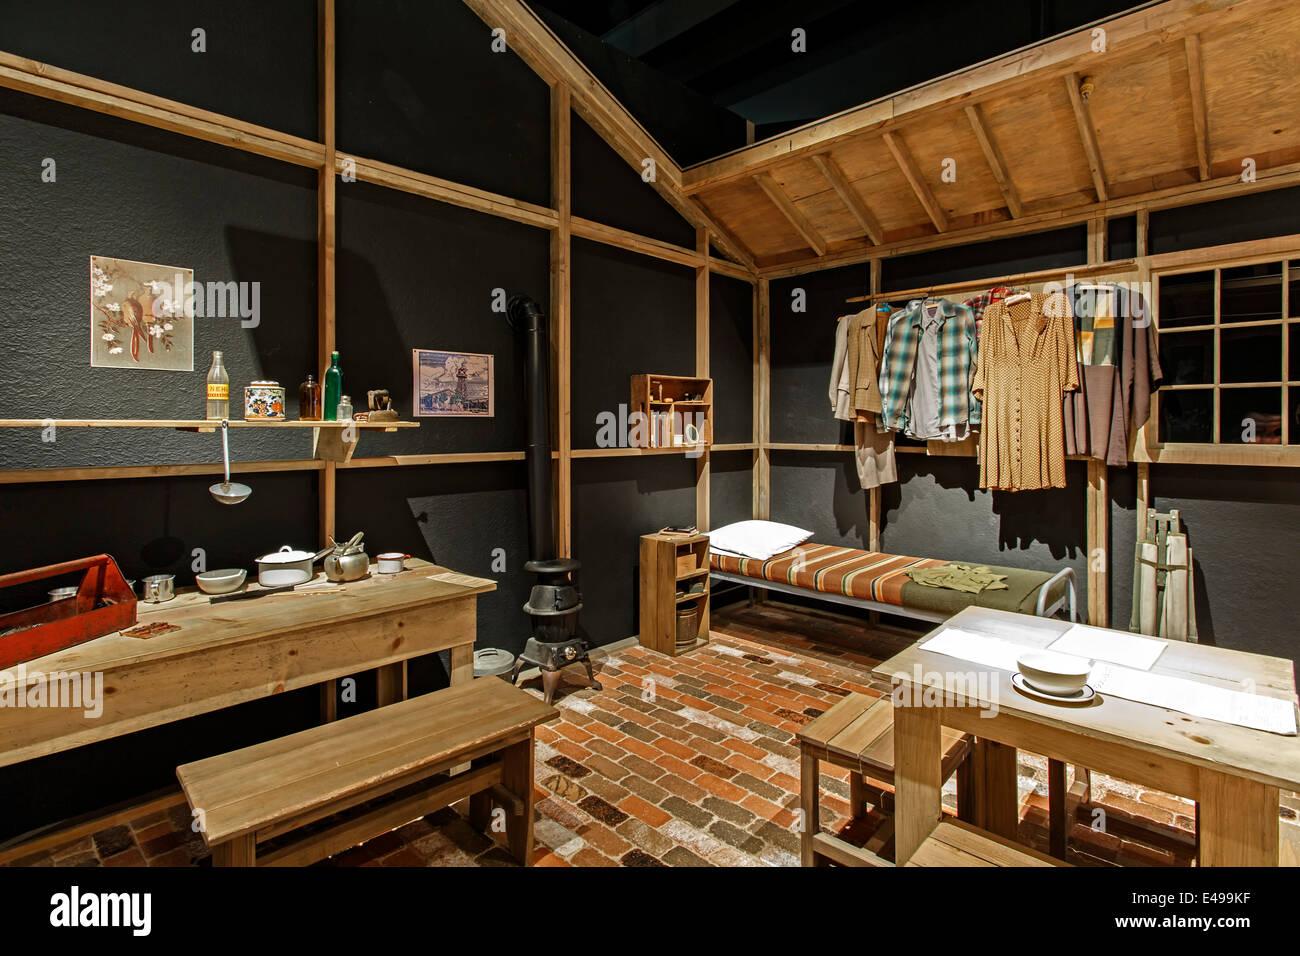 Re-creation of Japanese-American internment camp room, Colorado Stories Exhibit, History Colorado Center, Denver, - Stock Image